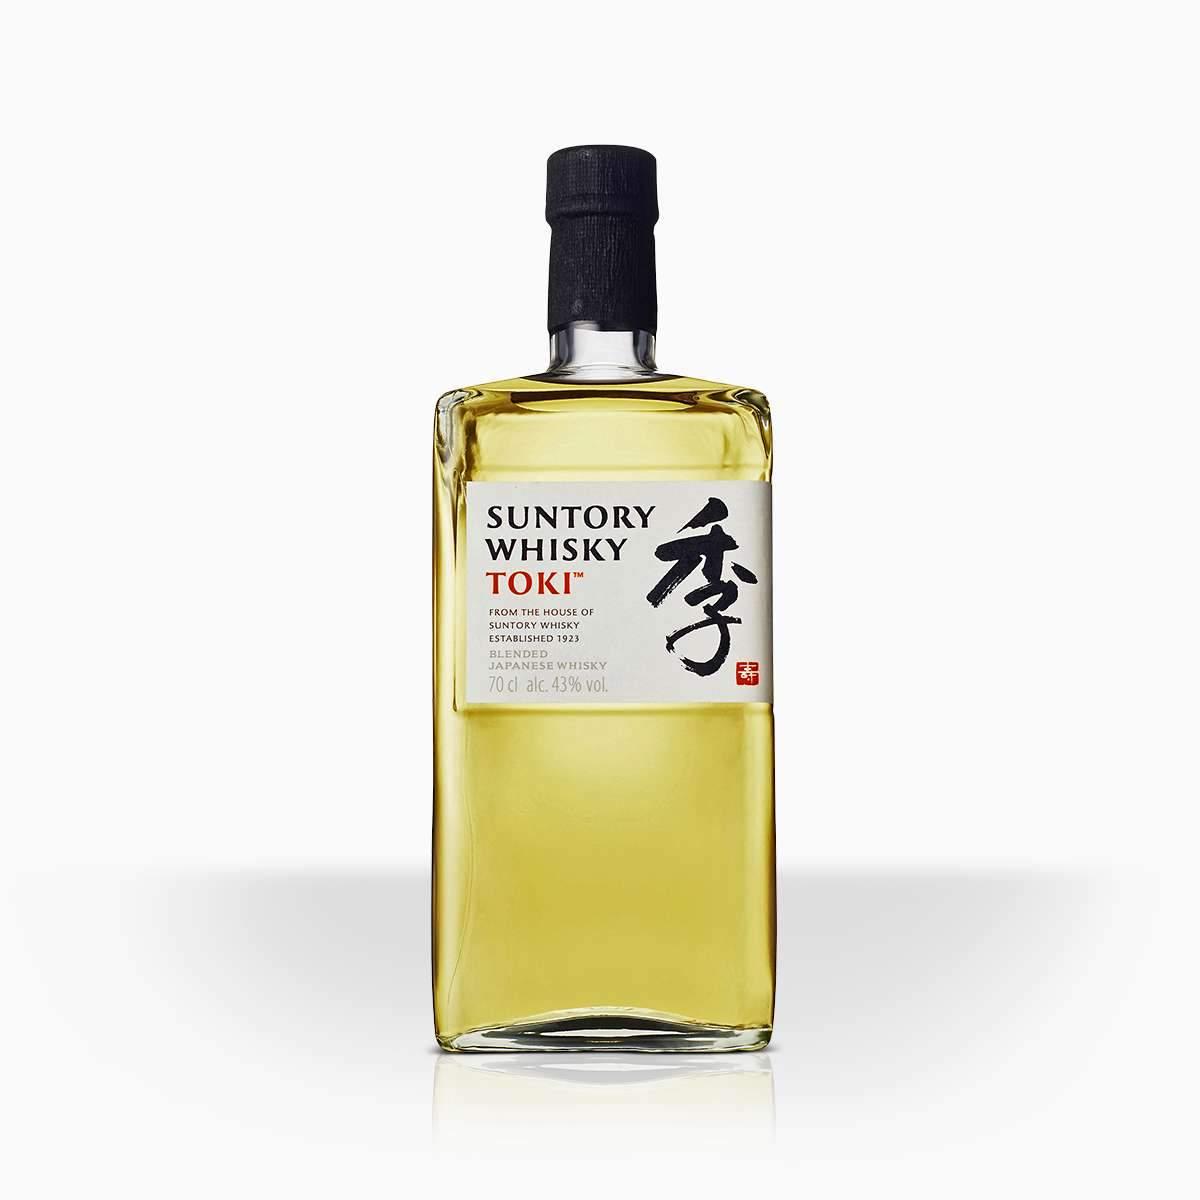 Whisky Suntory Toki 43% 0,7l